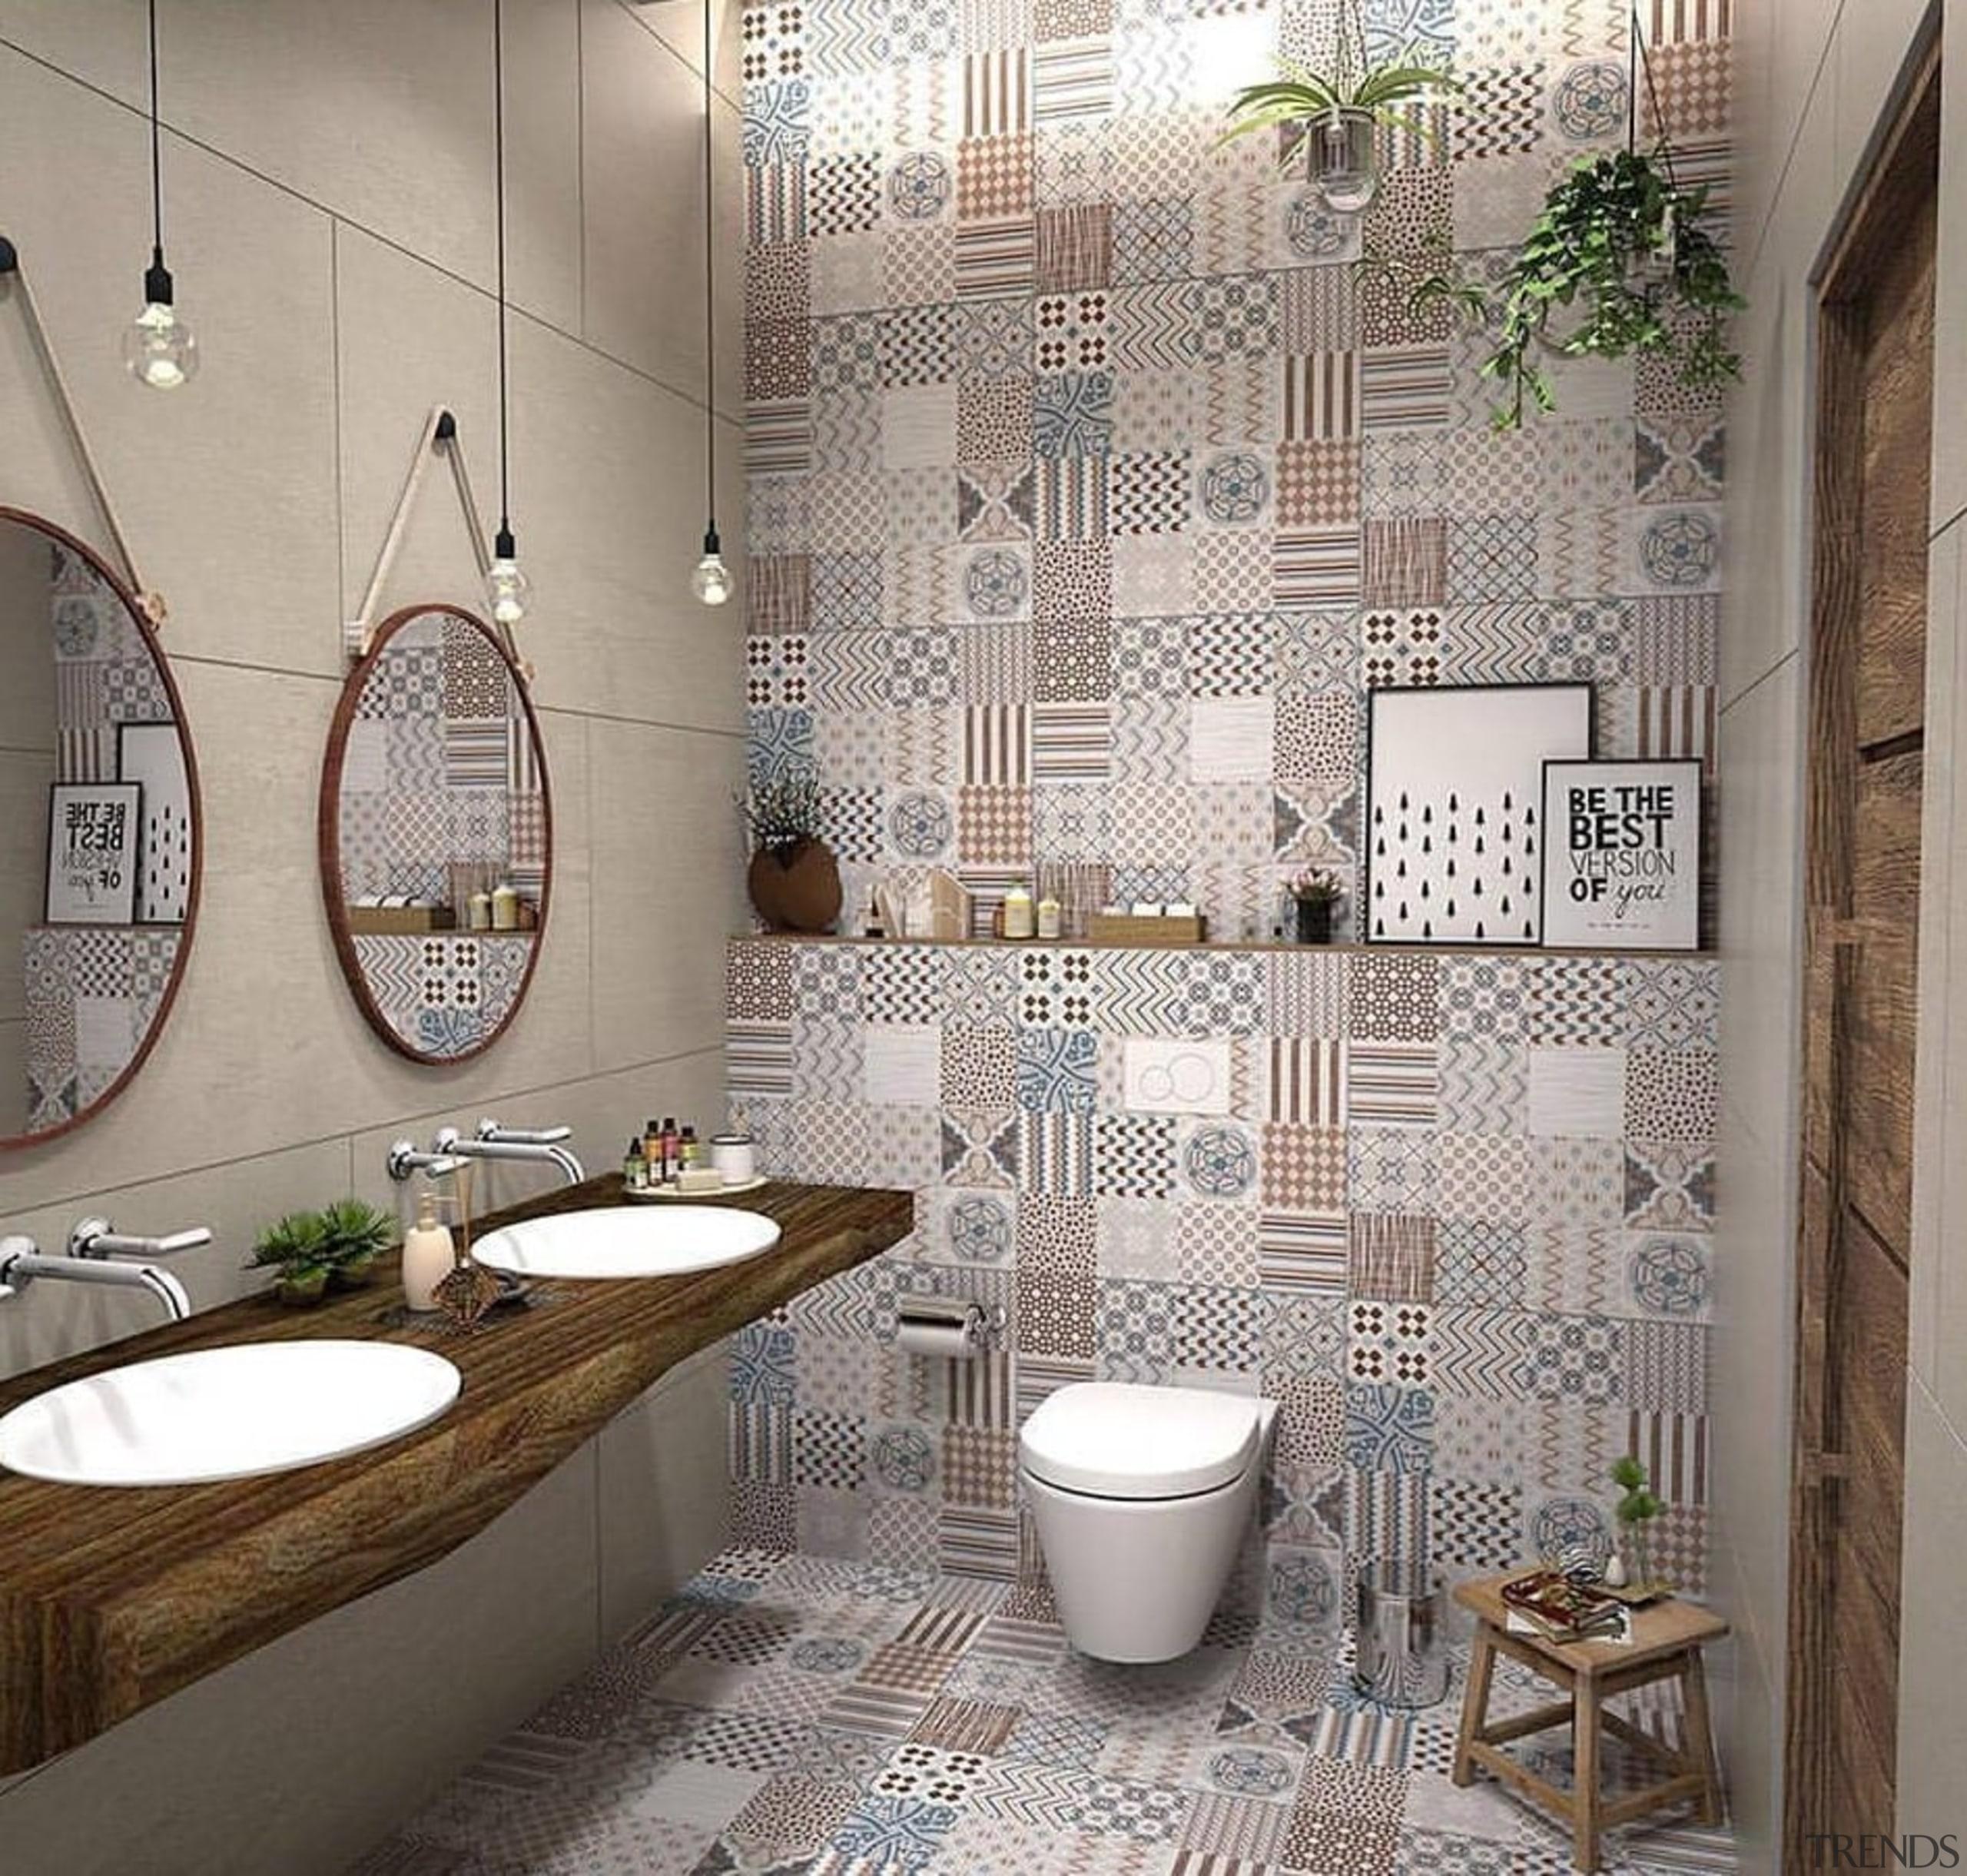 Graphite Hazel 600x600 - Graphite Hazel 600x600 - bathroom, ceramic, home, interior design, plumbing fixture, room, tile, wall, window, gray